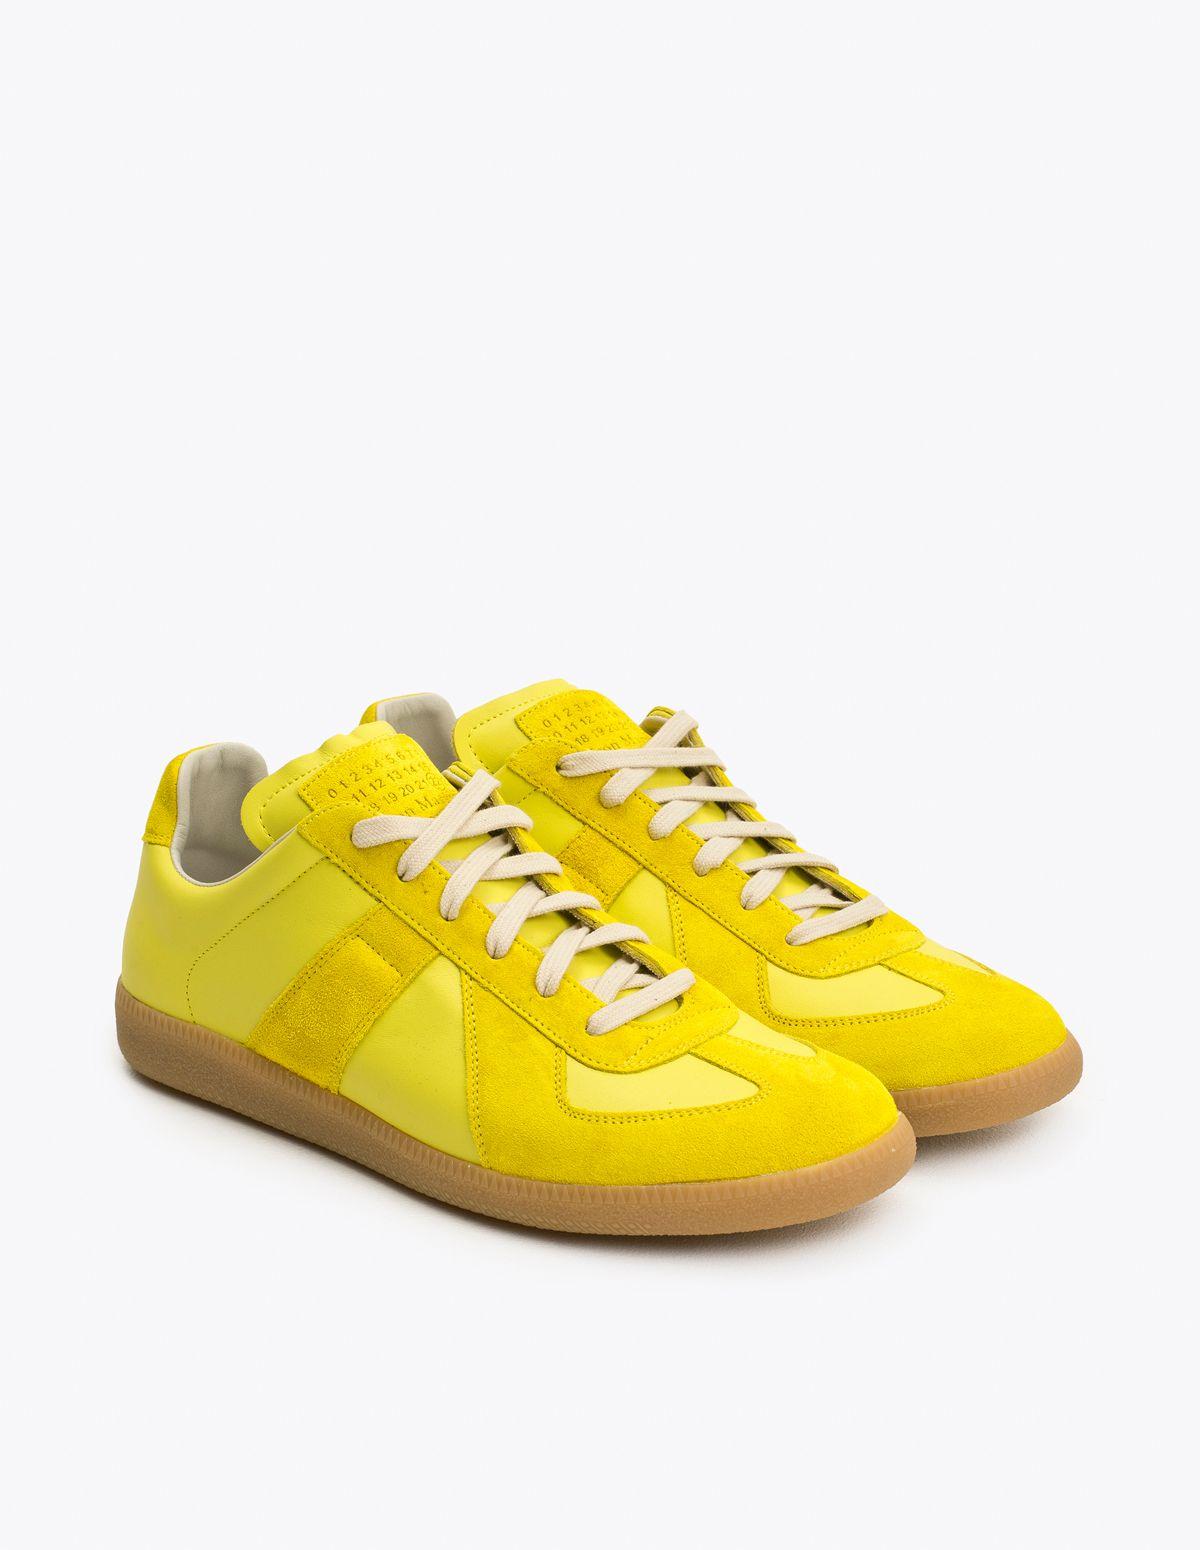 33eb3de9 Maison Margiela - Replica Sneakers Yellow   TRÈS BIEN   Clothing ...